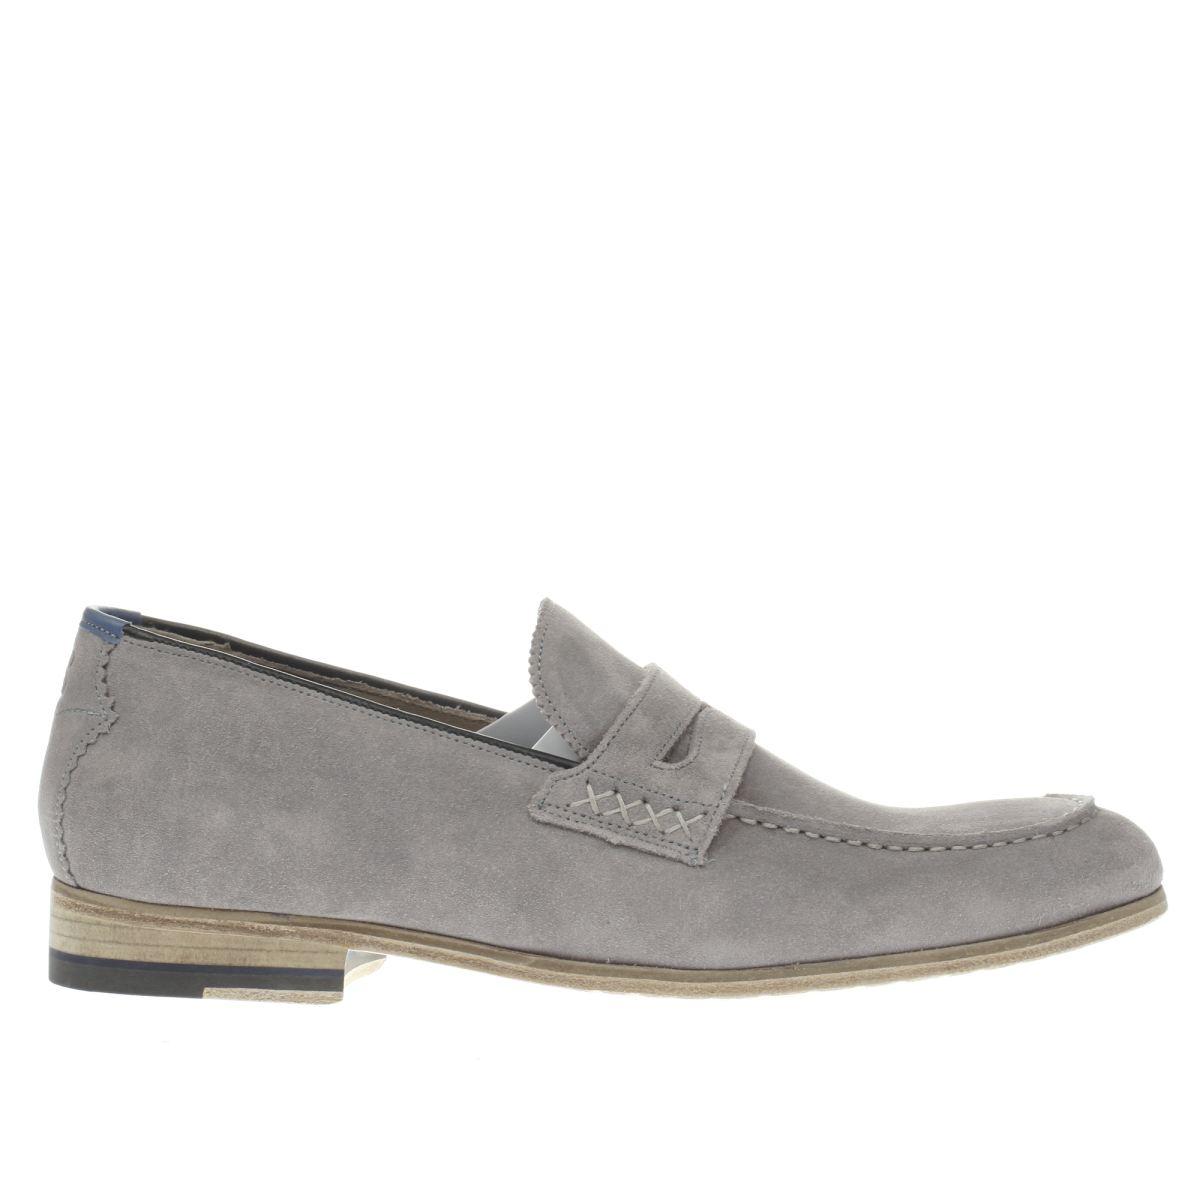 Oliver Sweeney Oliver Sweeney Grey Ashdown Shoes